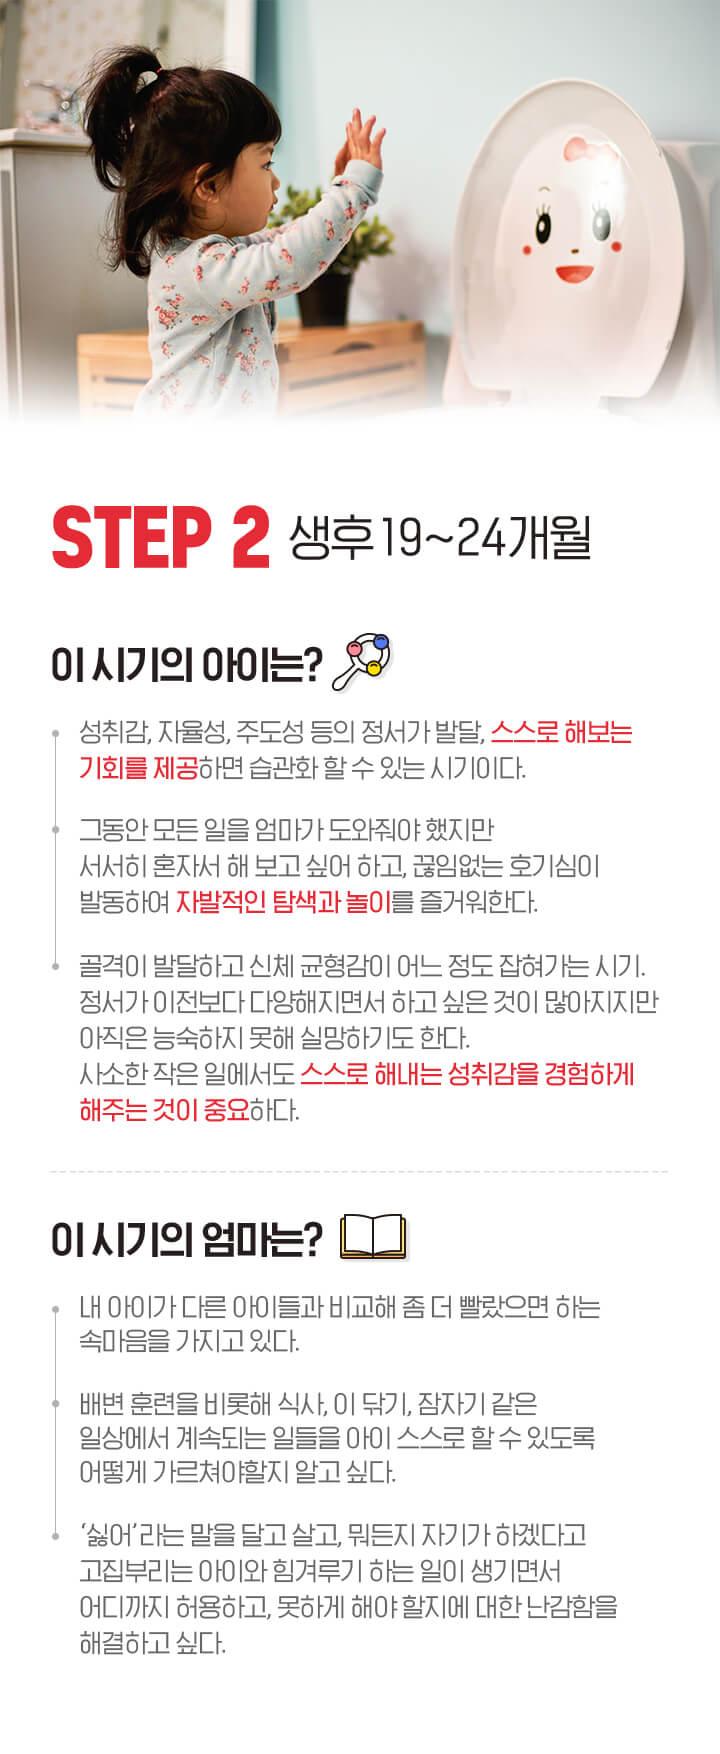 STEP 2 생후 19~24개월